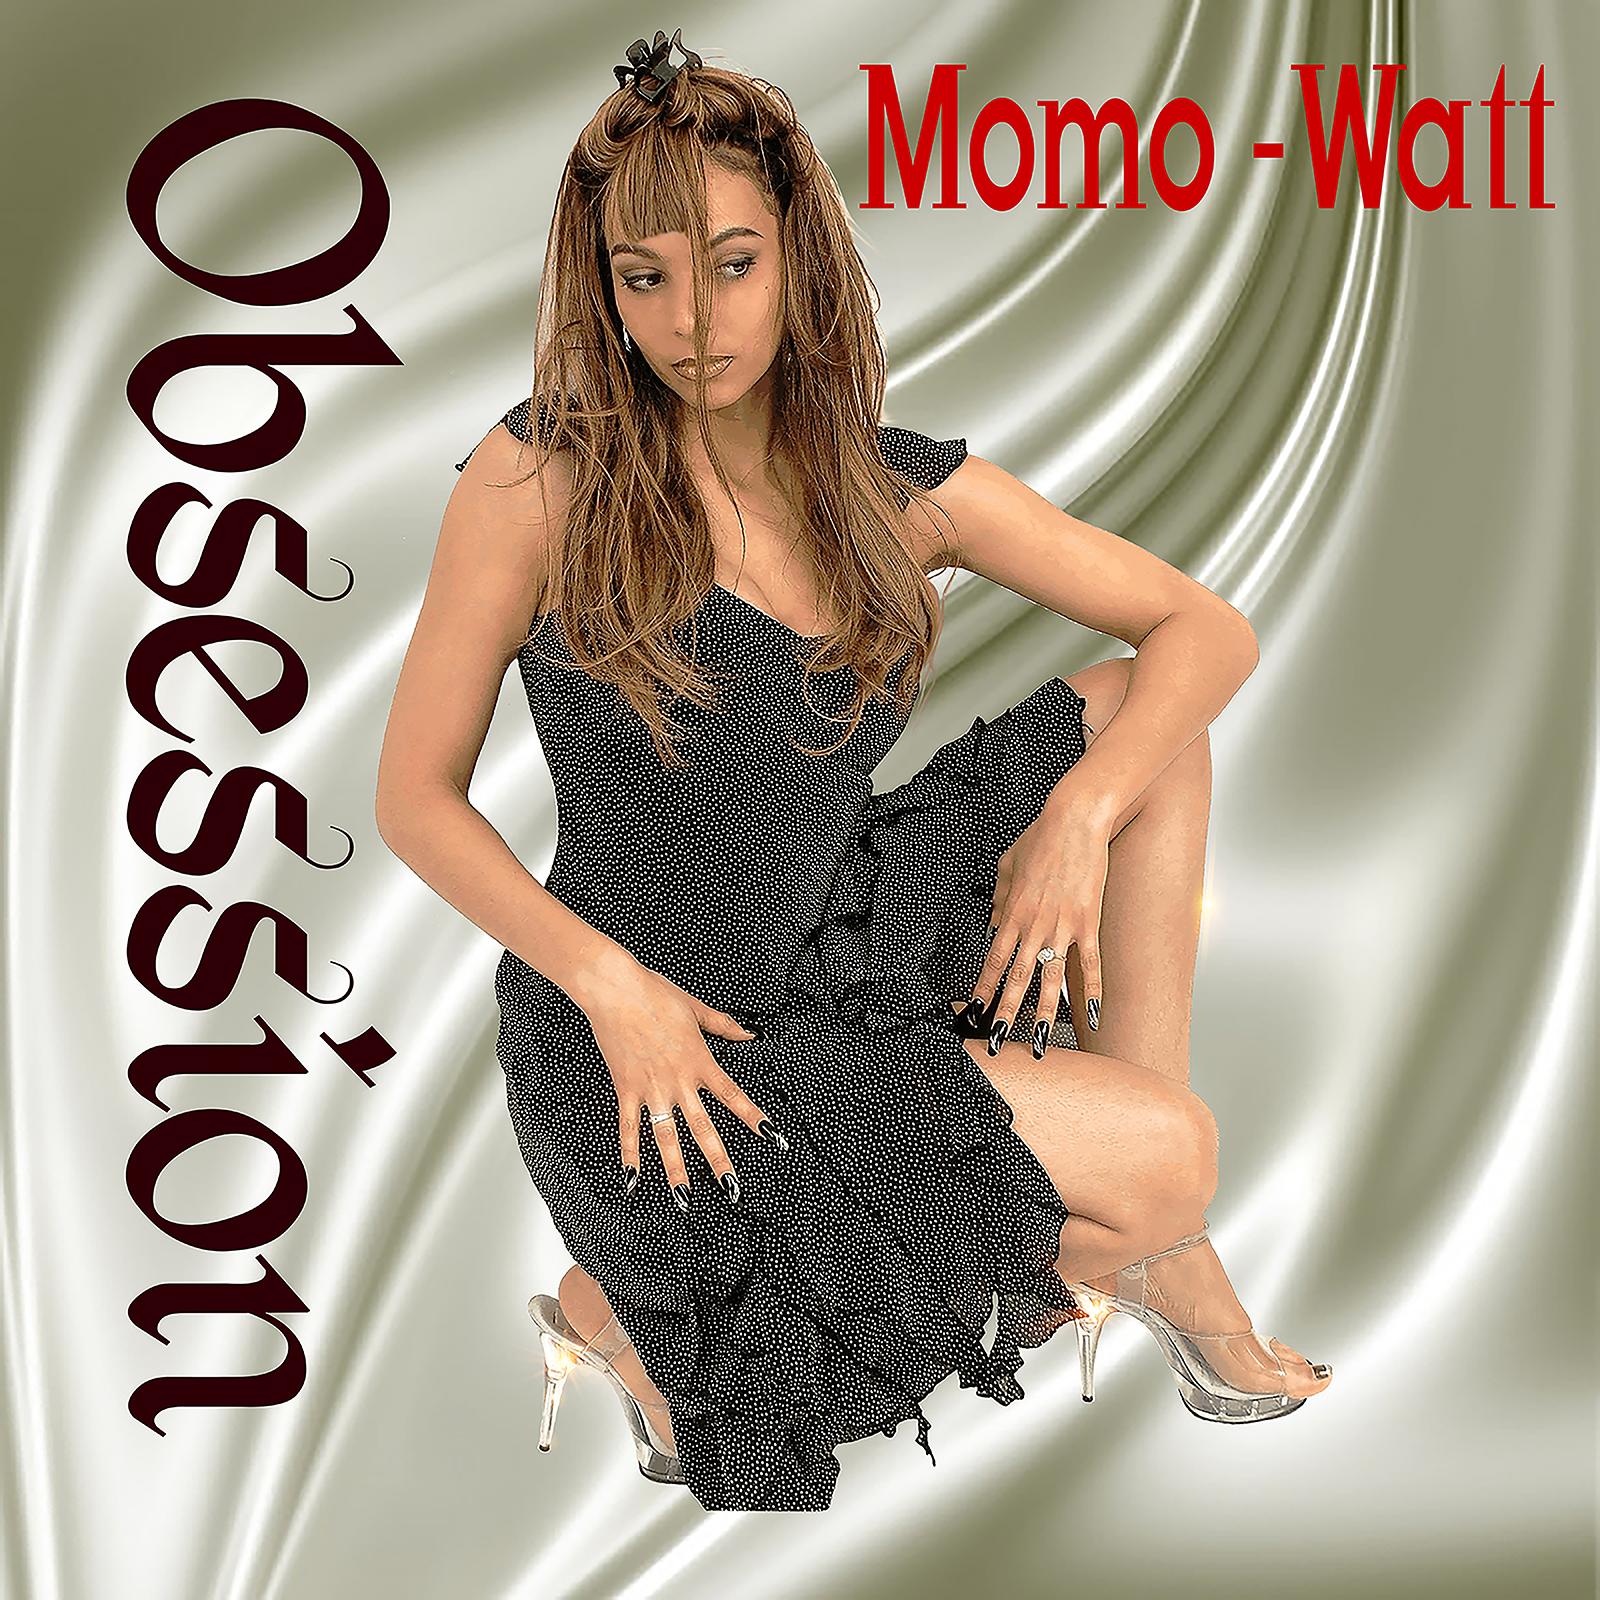 Obsession – Momo-Watt